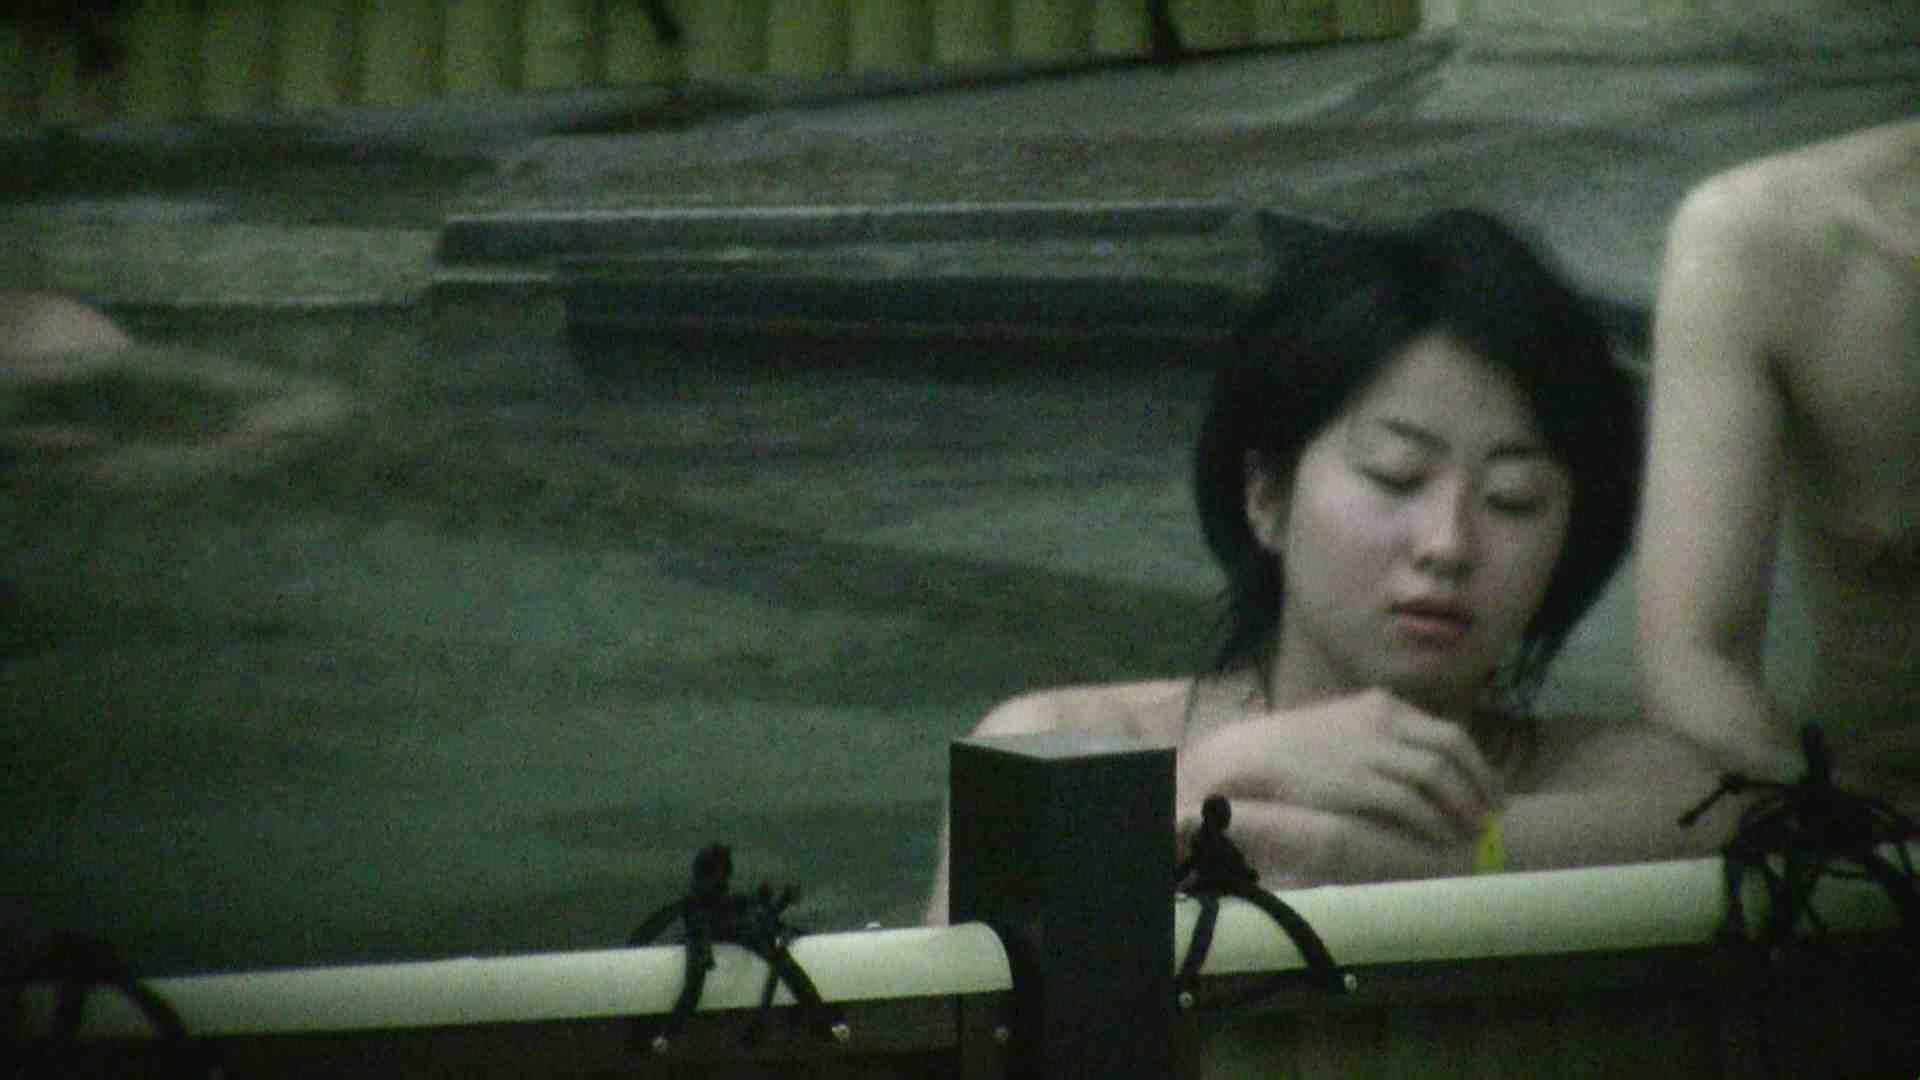 Aquaな露天風呂Vol.112 盗撮シリーズ   露天風呂編  93PIX 67